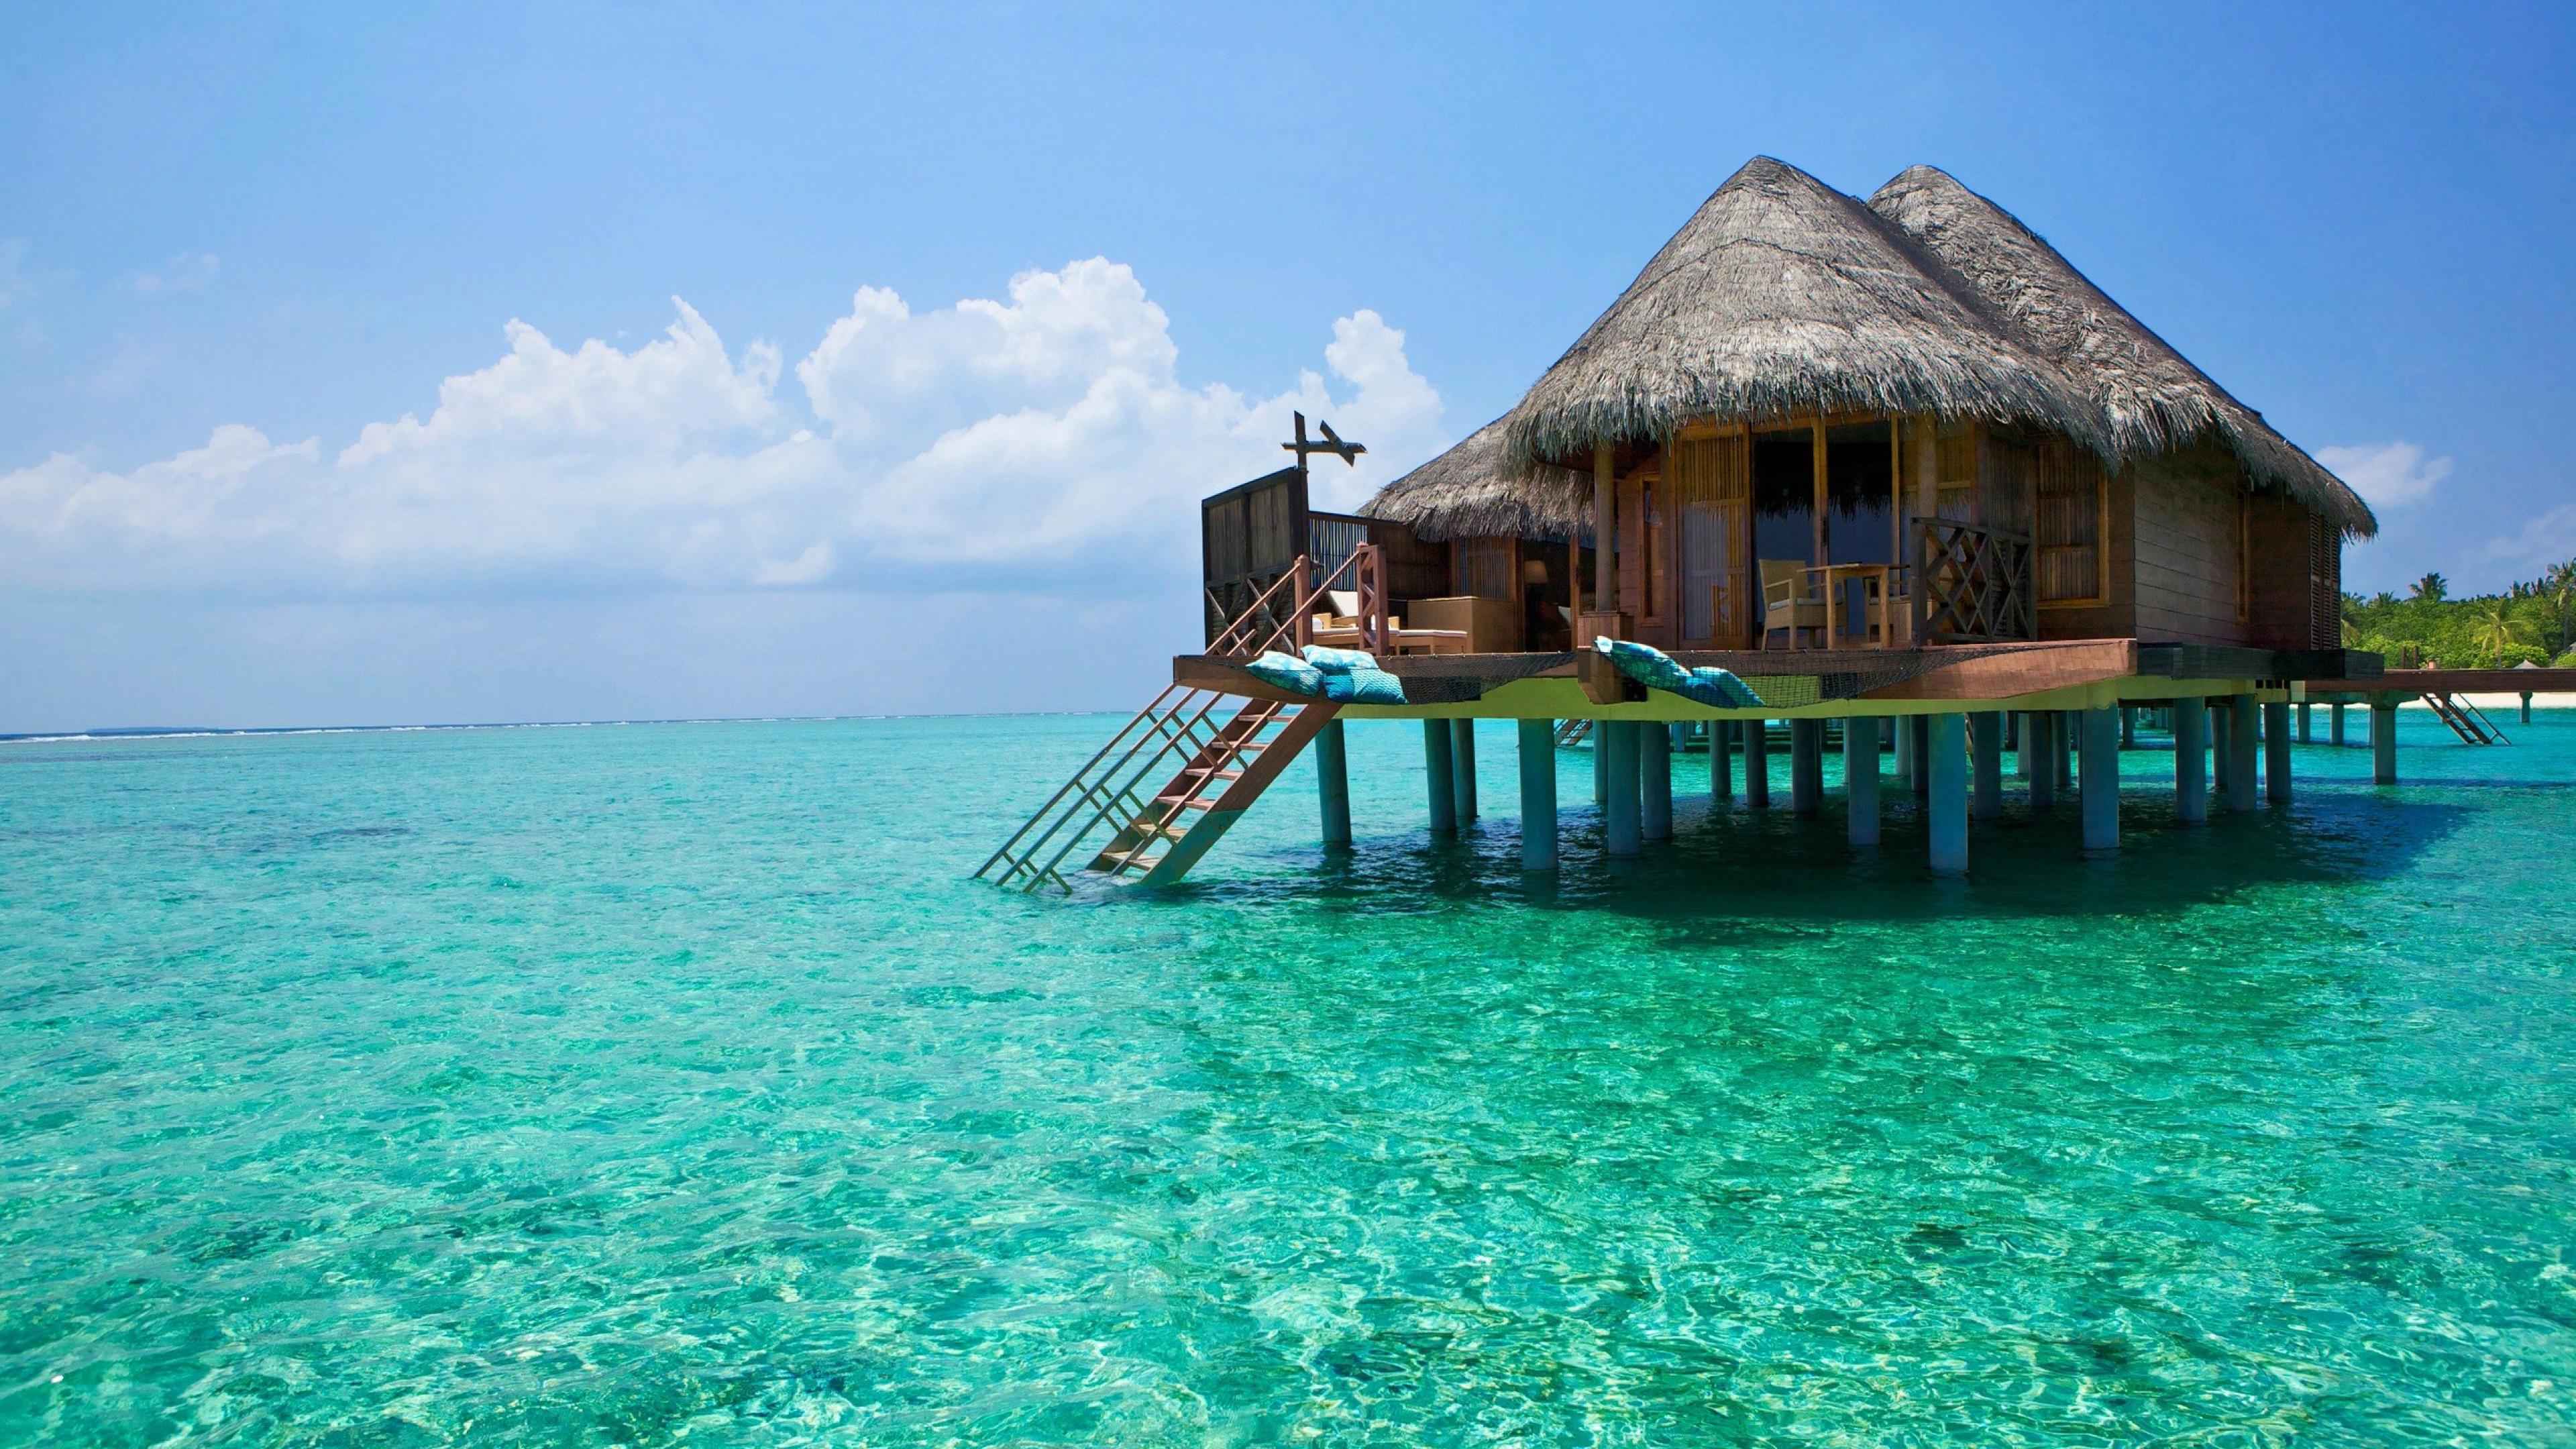 Download Wallpaper 3840x2160 bali island ocean bungalows 4K Ultra 3840x2160